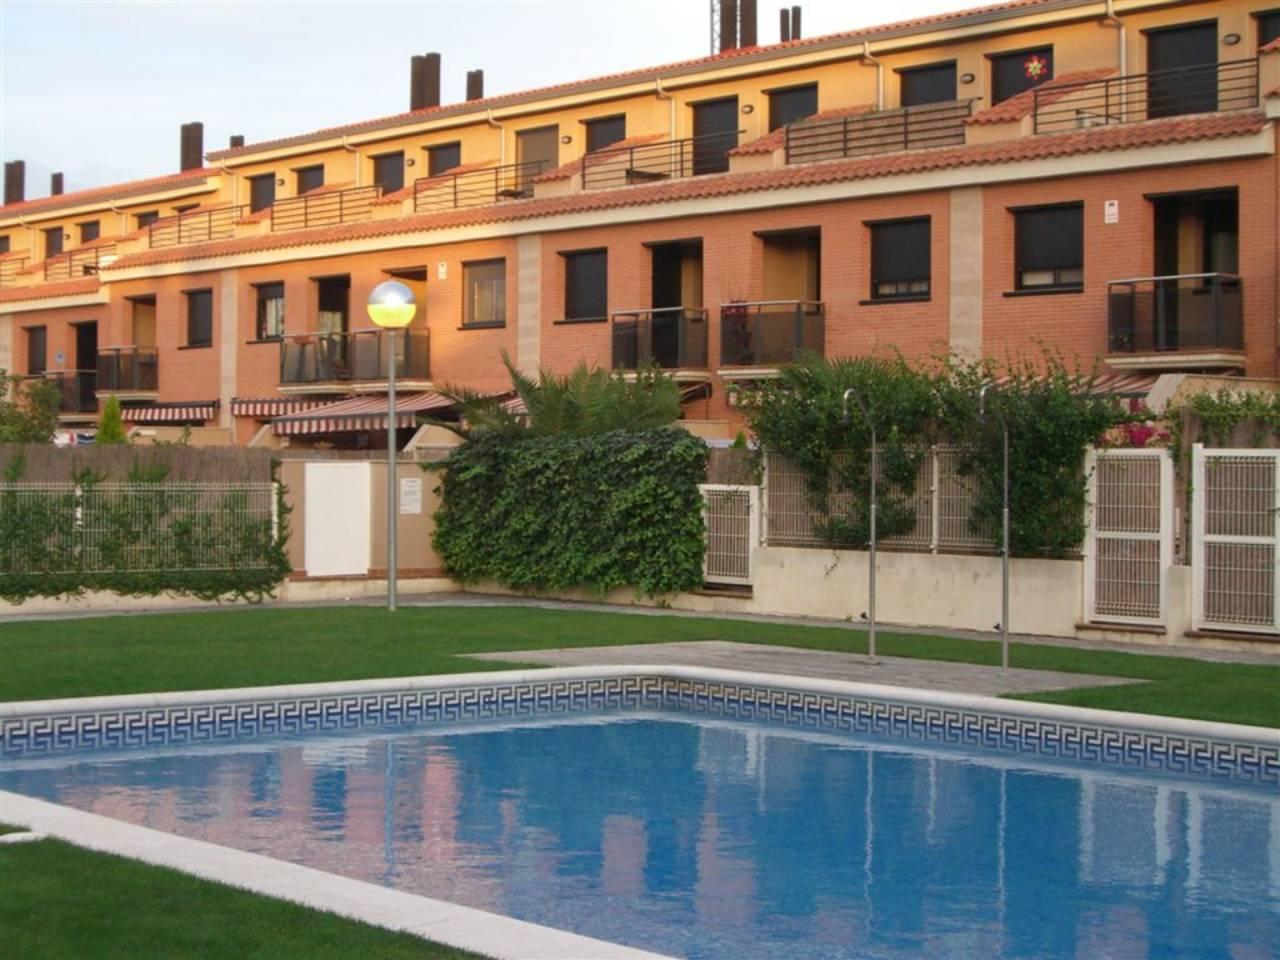 Lloguer Casa  Vilanova del vallès. Sup. 220m , 3 habitaciones (1 suite) 2 baños, 1 aseo, cocina, la